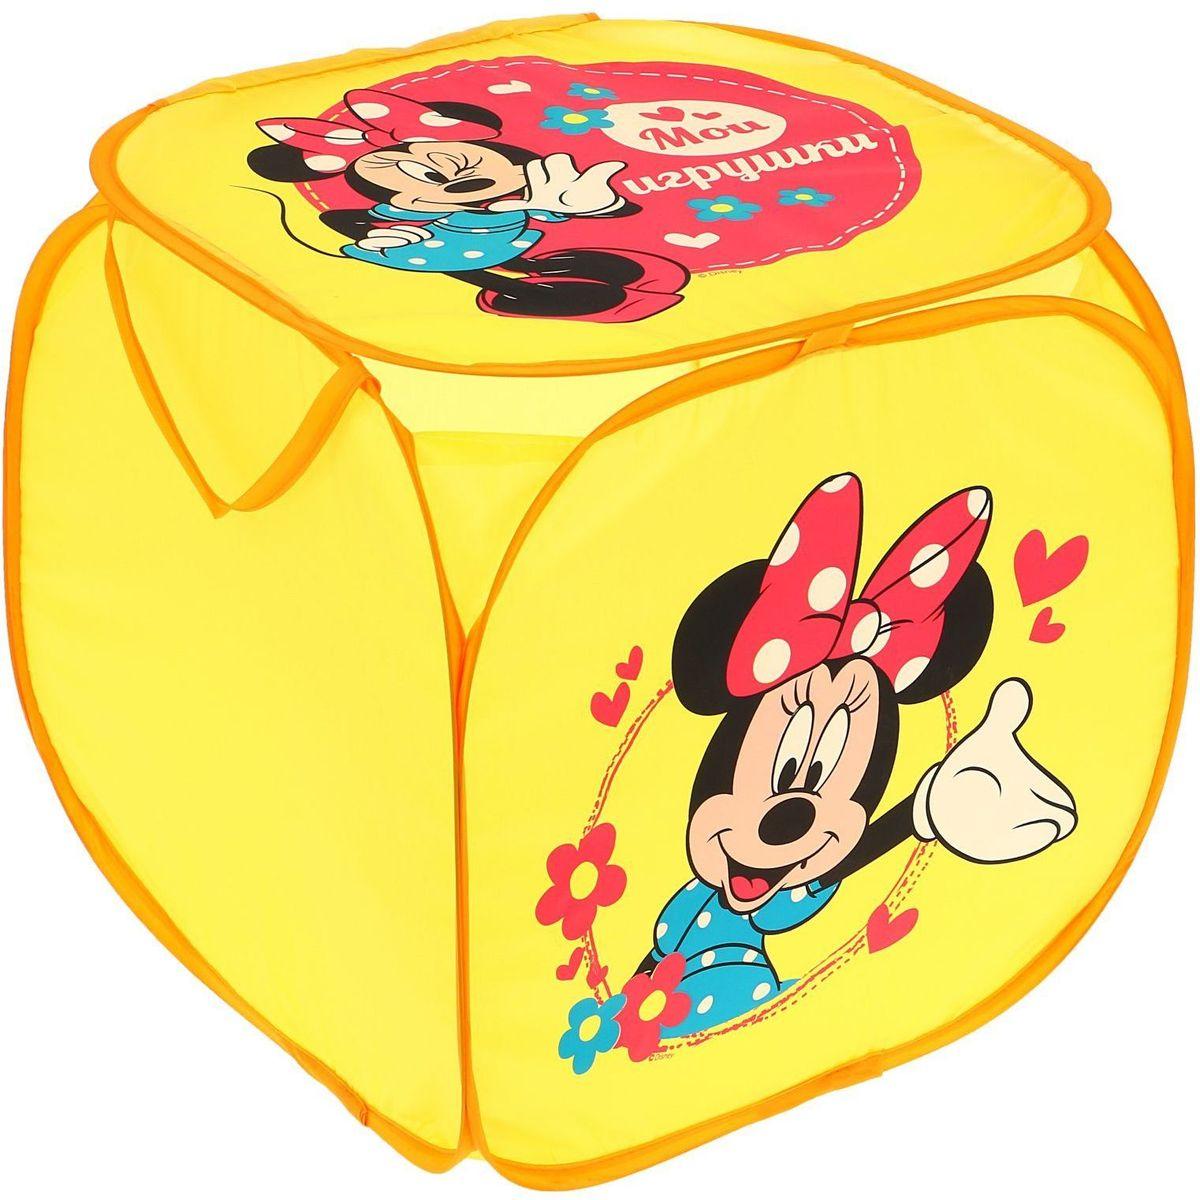 Disney Корзина для хранения Мои игрушки Минни Маус лонгслив мужской reebok ost ls comp tee printed цвет темно серый dp6563 размер s 46